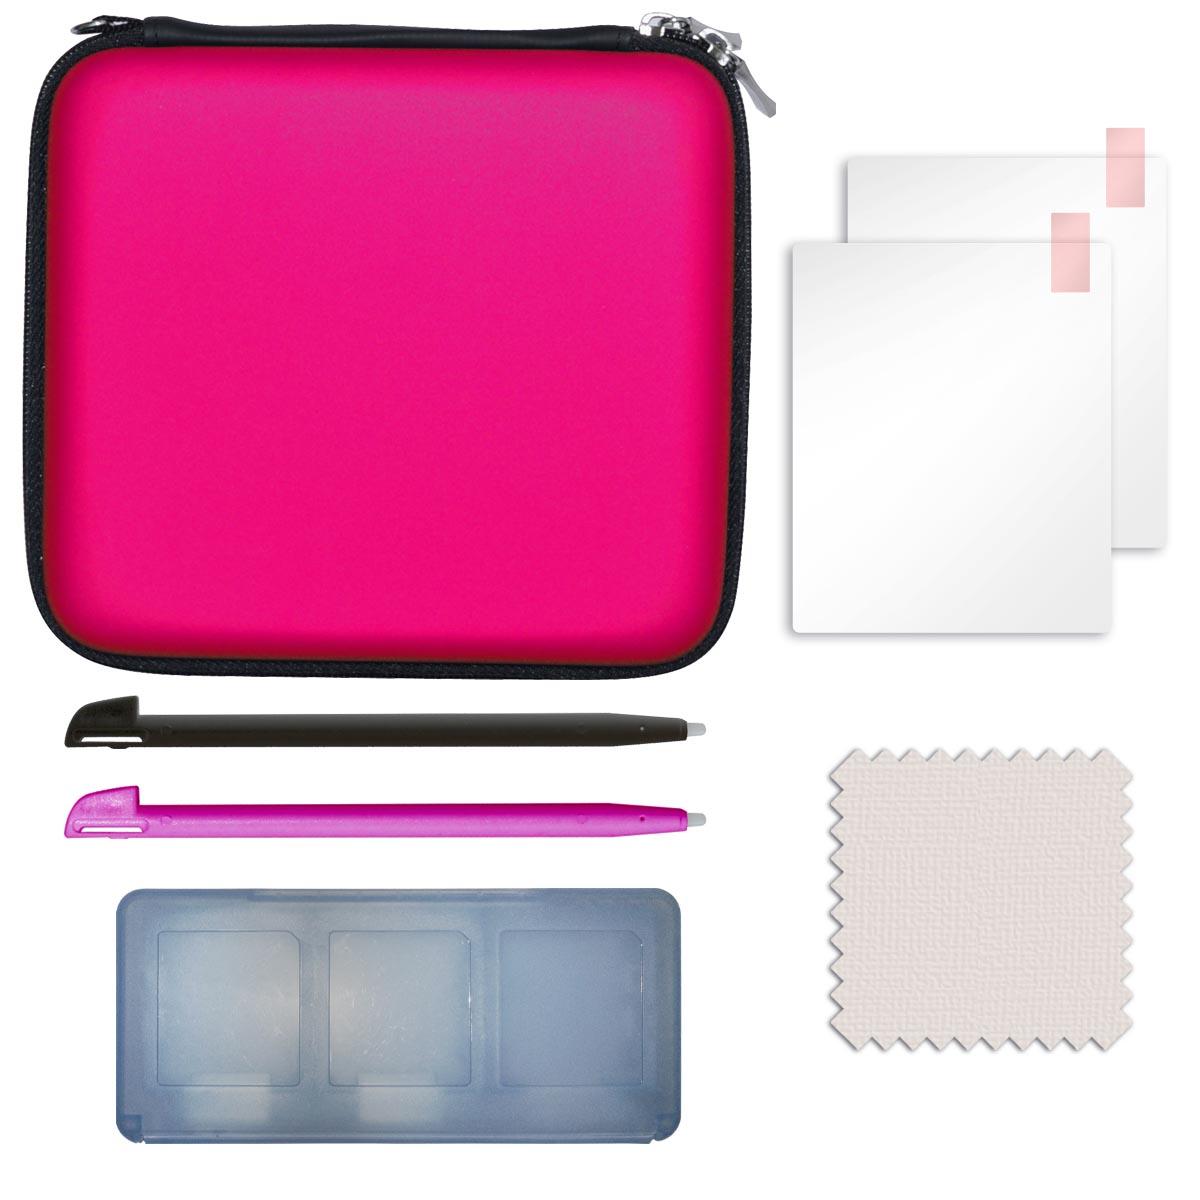 Dea factory starter pack rose nintendo 2ds accessoires for Housse 2ds pokemon